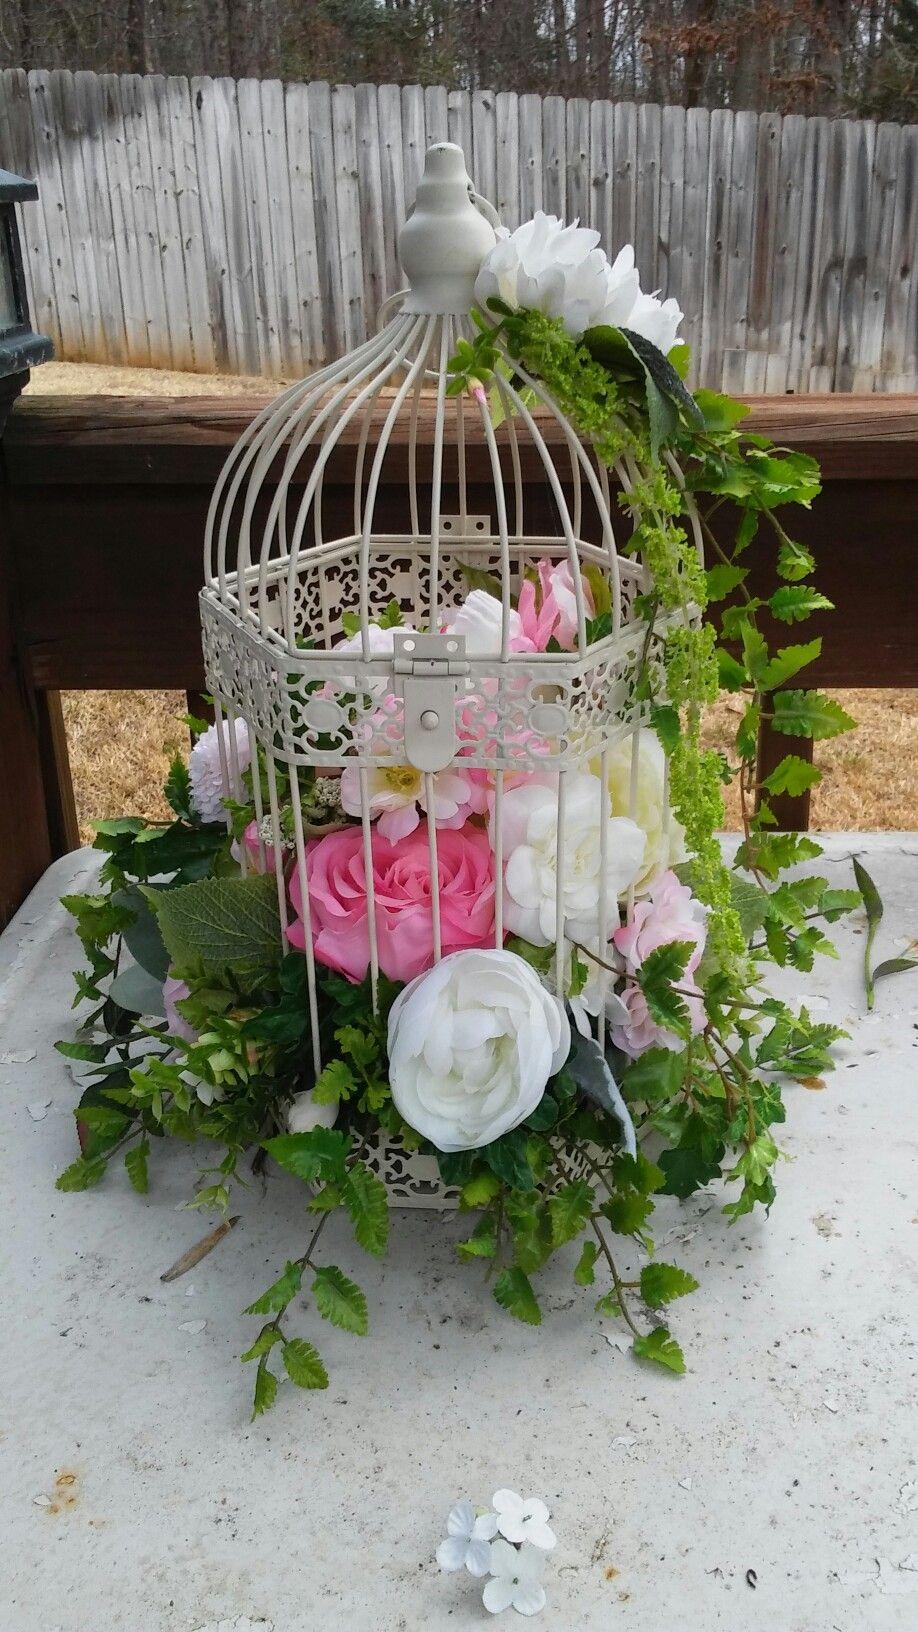 Birdcage Wedding Decor Centerpiece Wedding Decor Pinterest